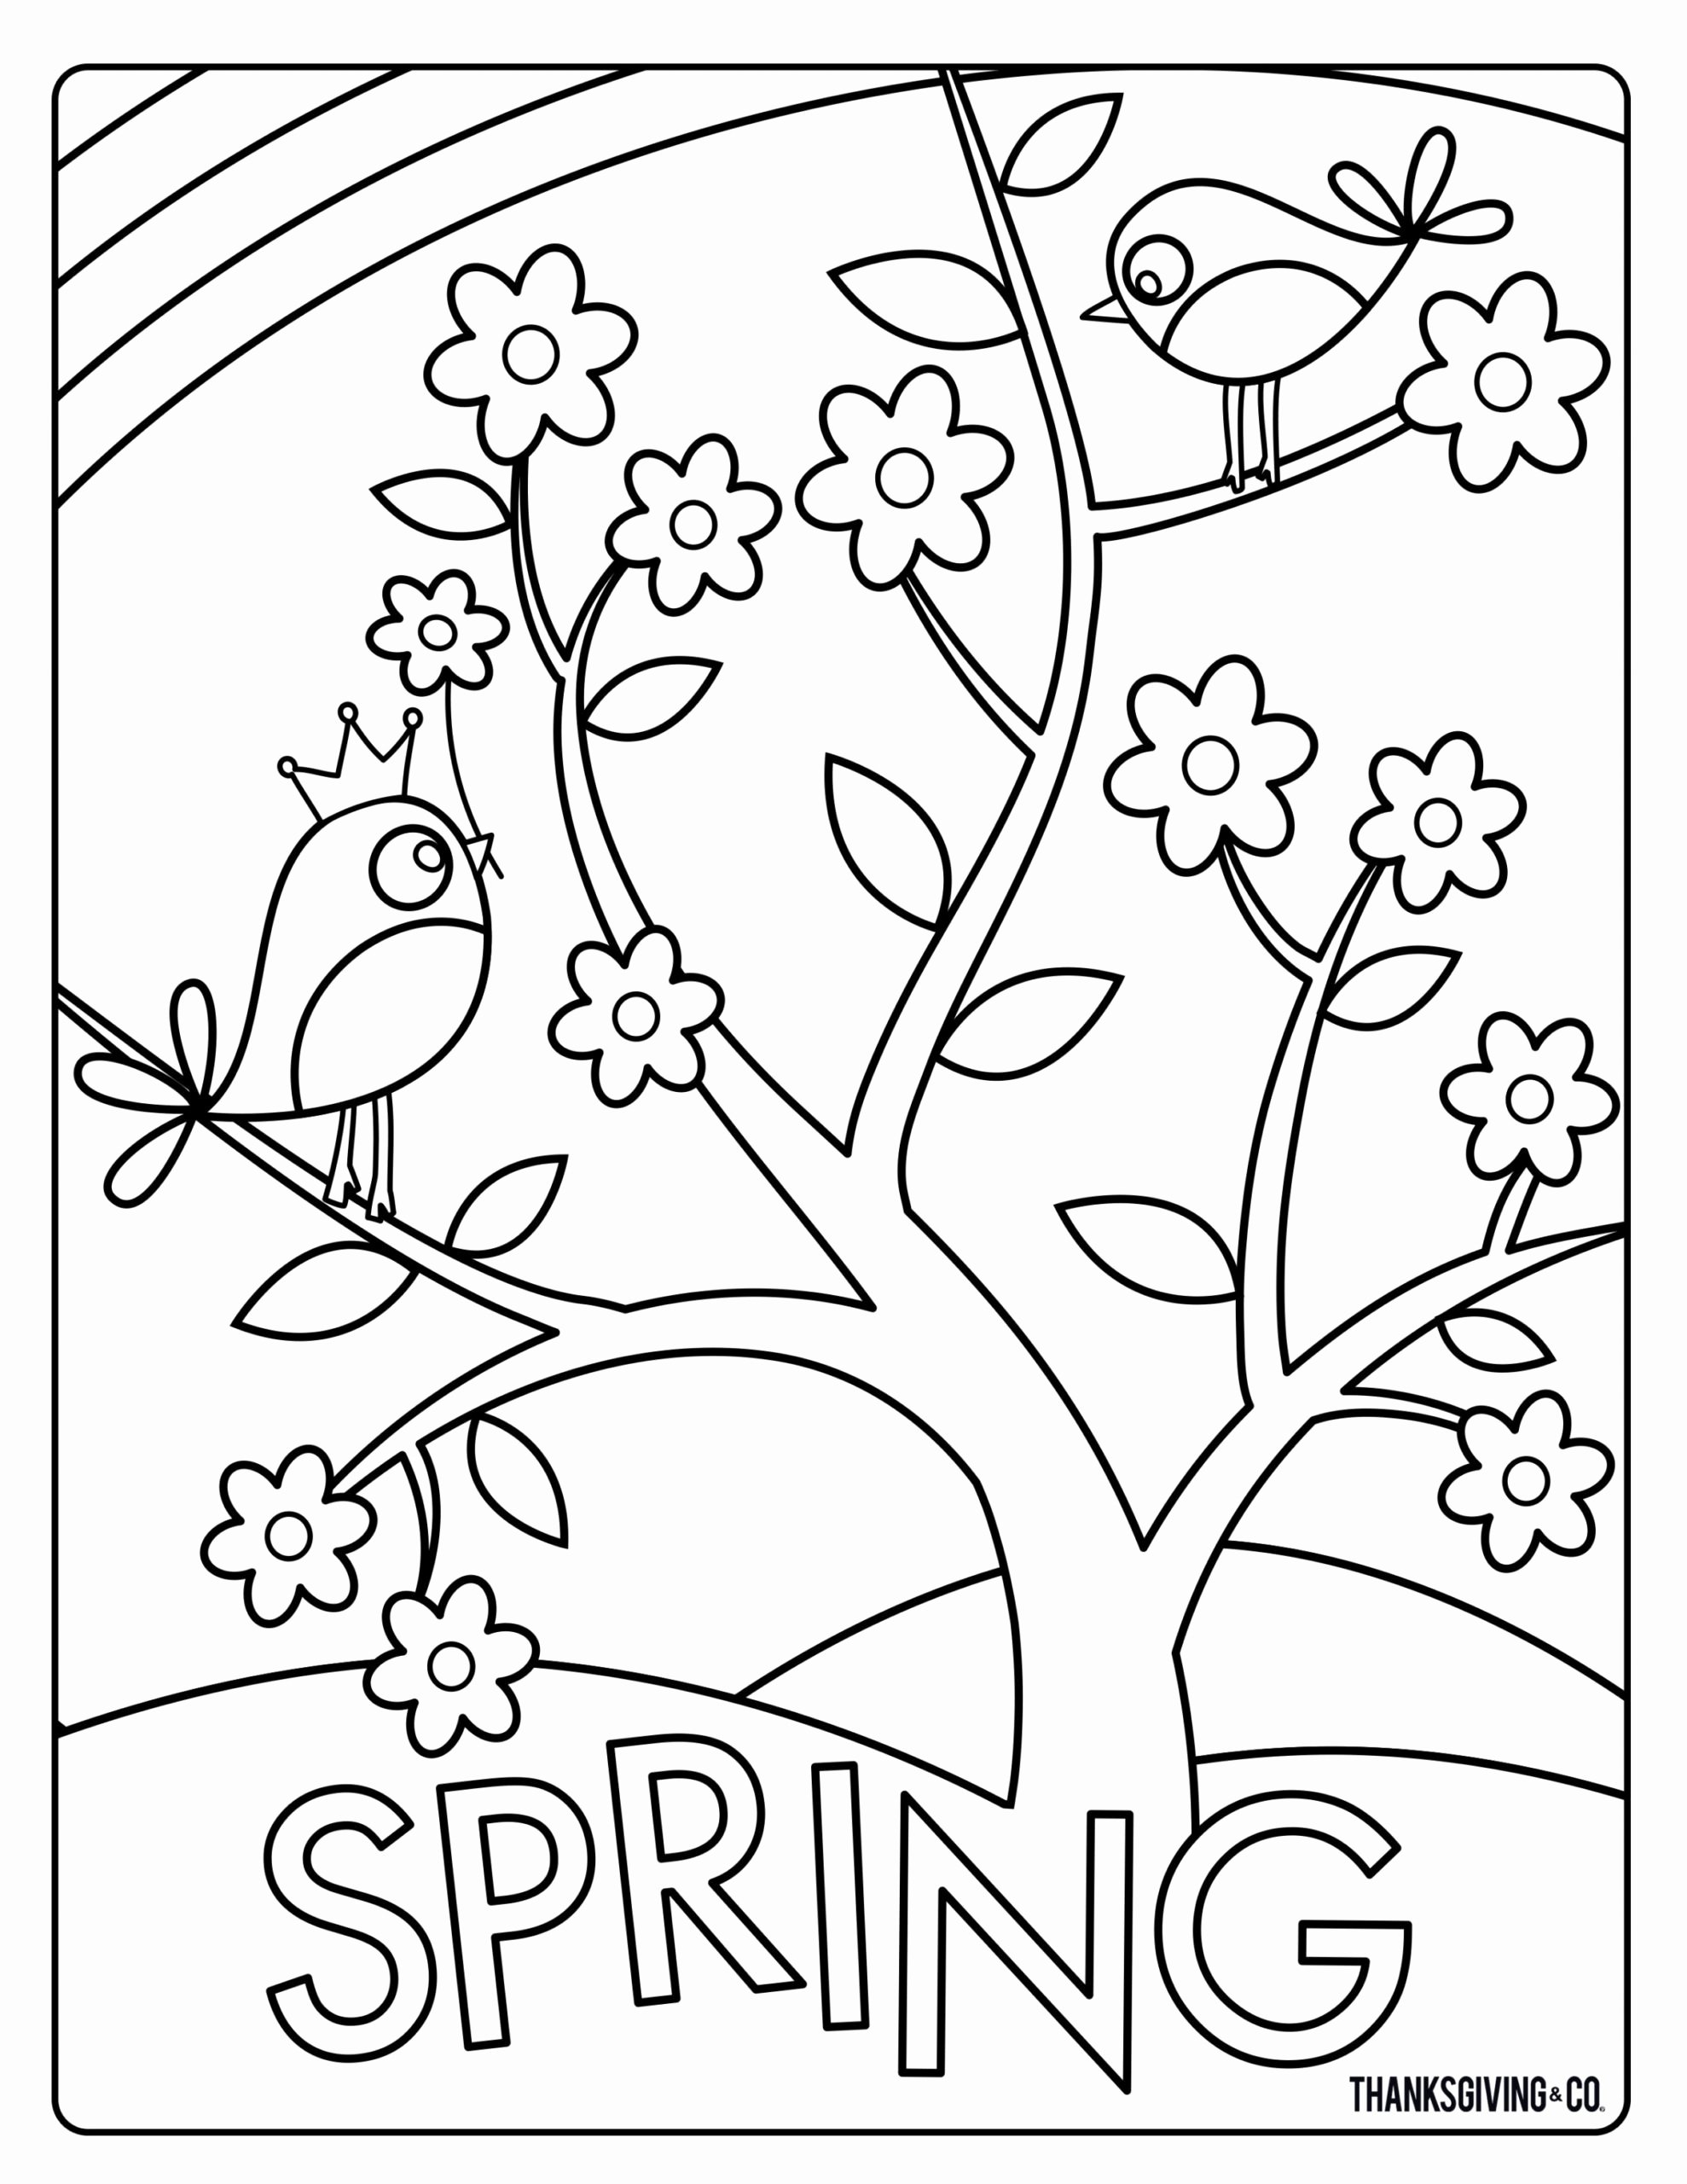 Spring Worksheets for Preschoolers Lovely Spring Coloring Sheets for toddlers Coloringheets Happy Kids